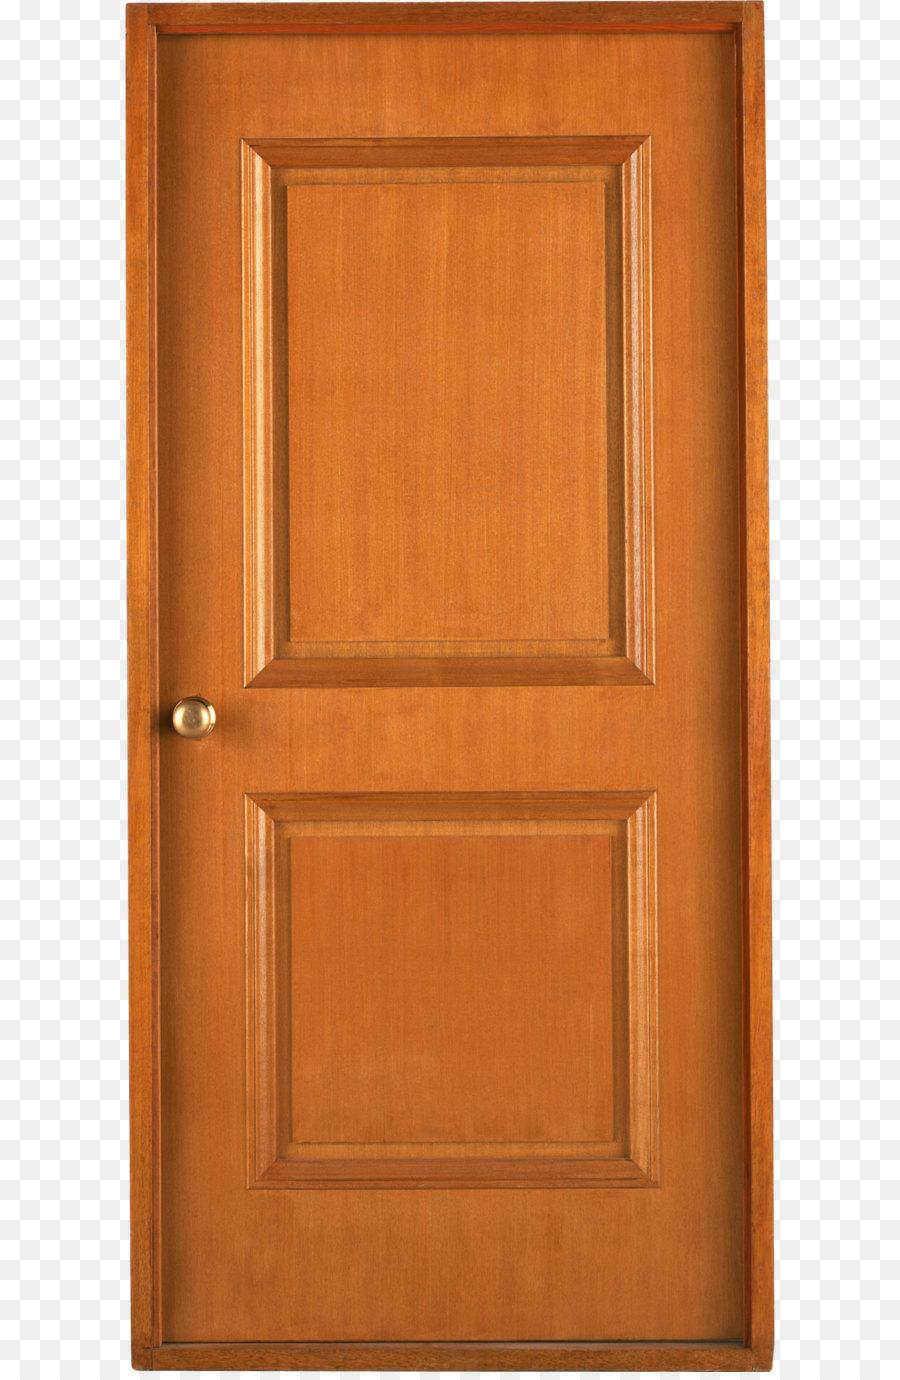 svg royalty free Wood background png download. Door transparent